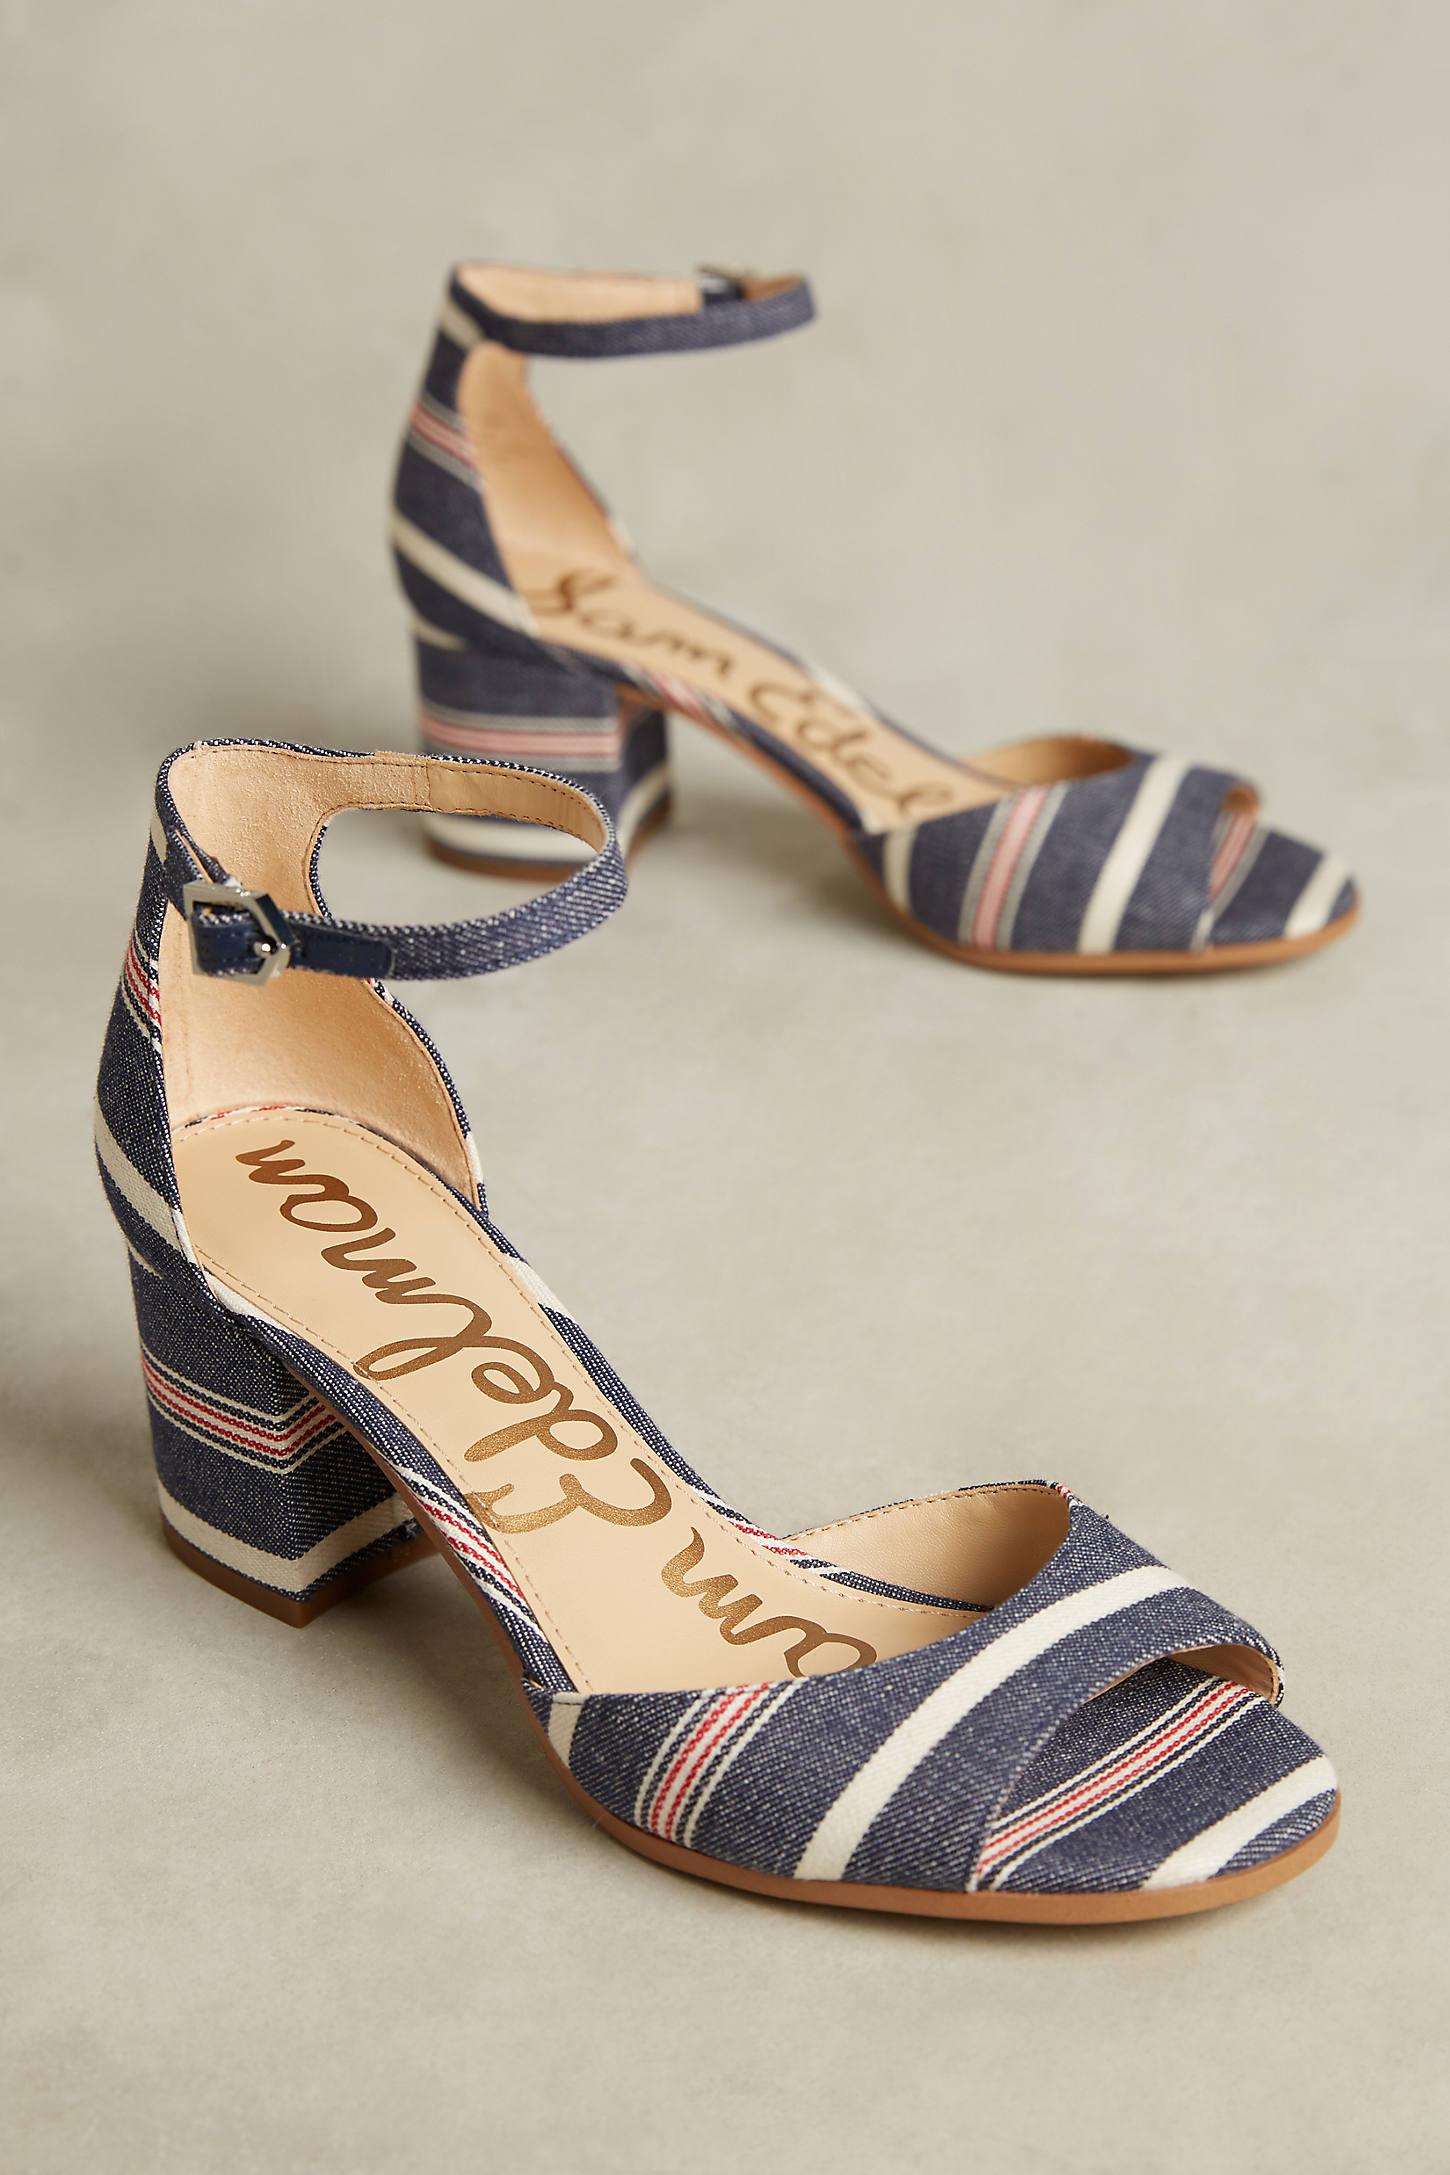 Sam Edelman Susie Block Heel Sandals